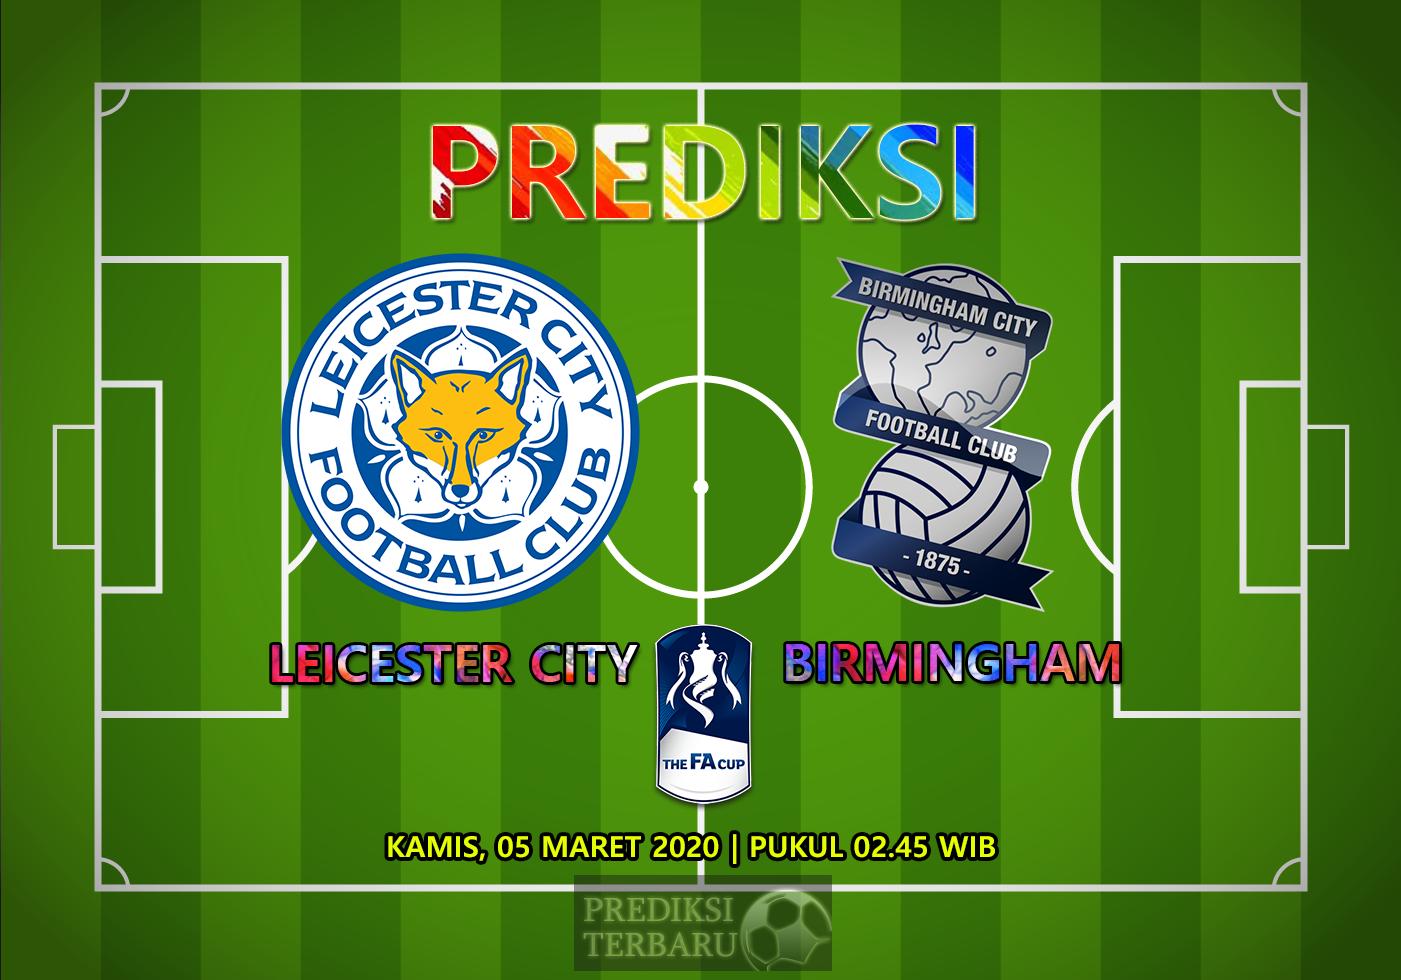 Prediksi Leicester City Vs Birmingham City Kamis 05 Maret